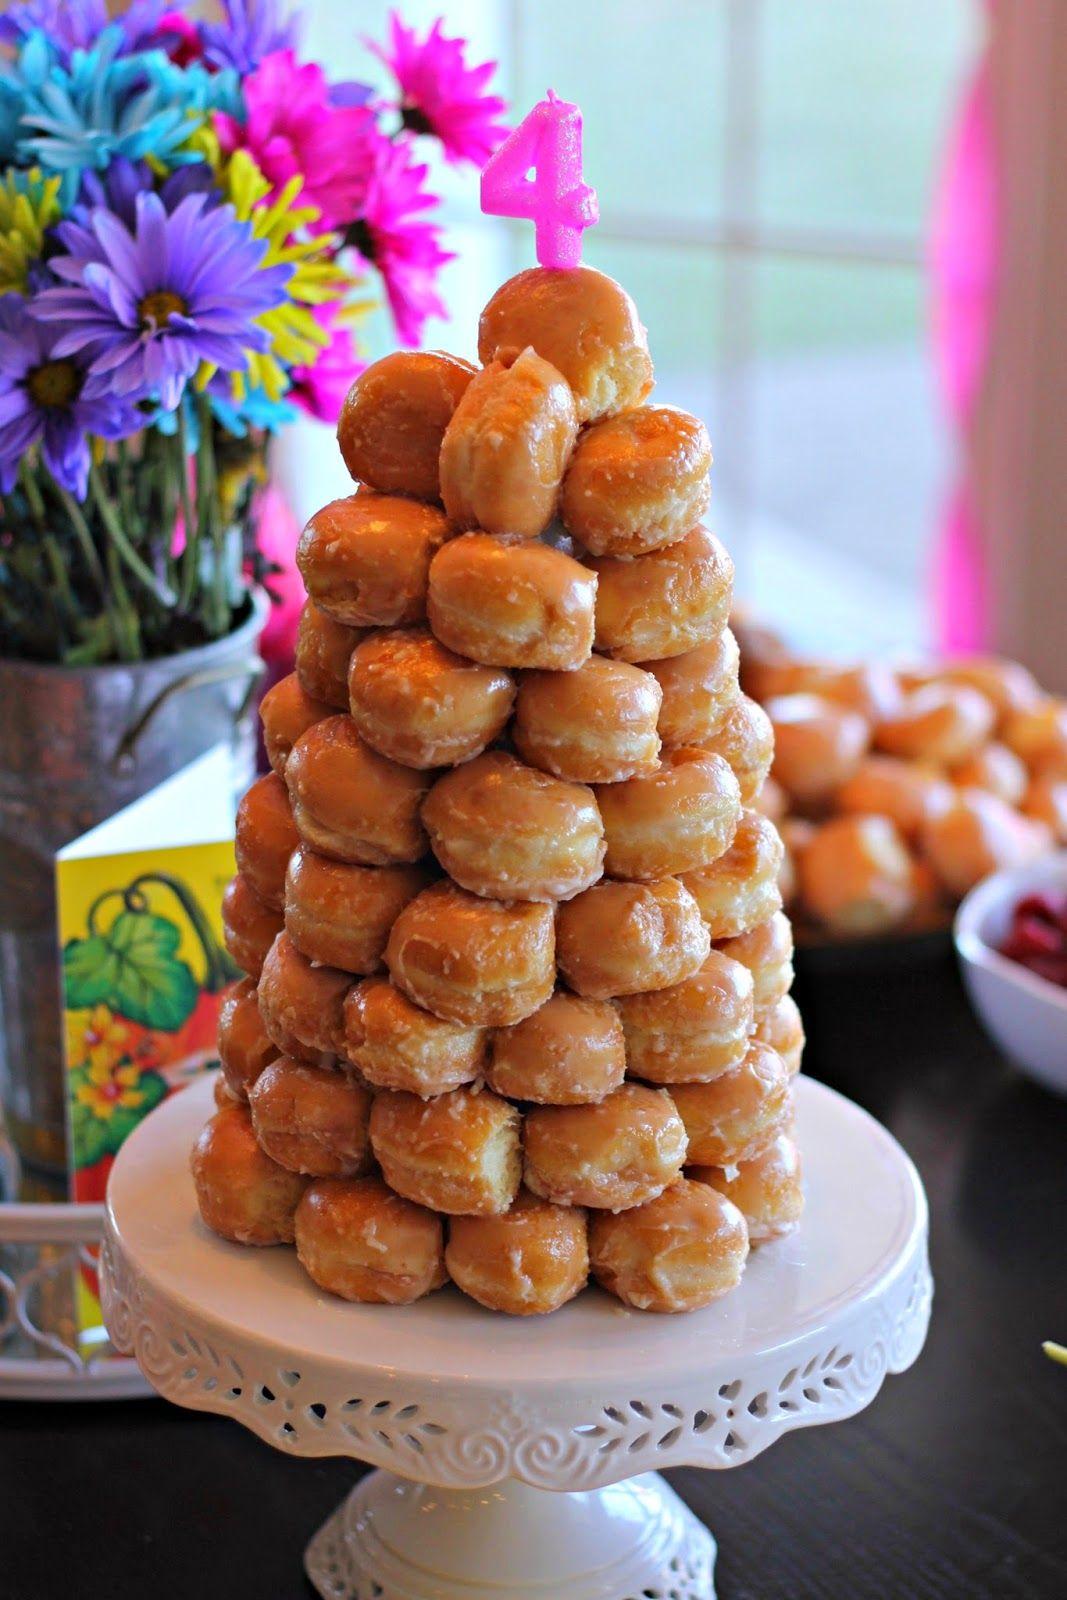 Abigails 4th donut birthday party birthday donuts